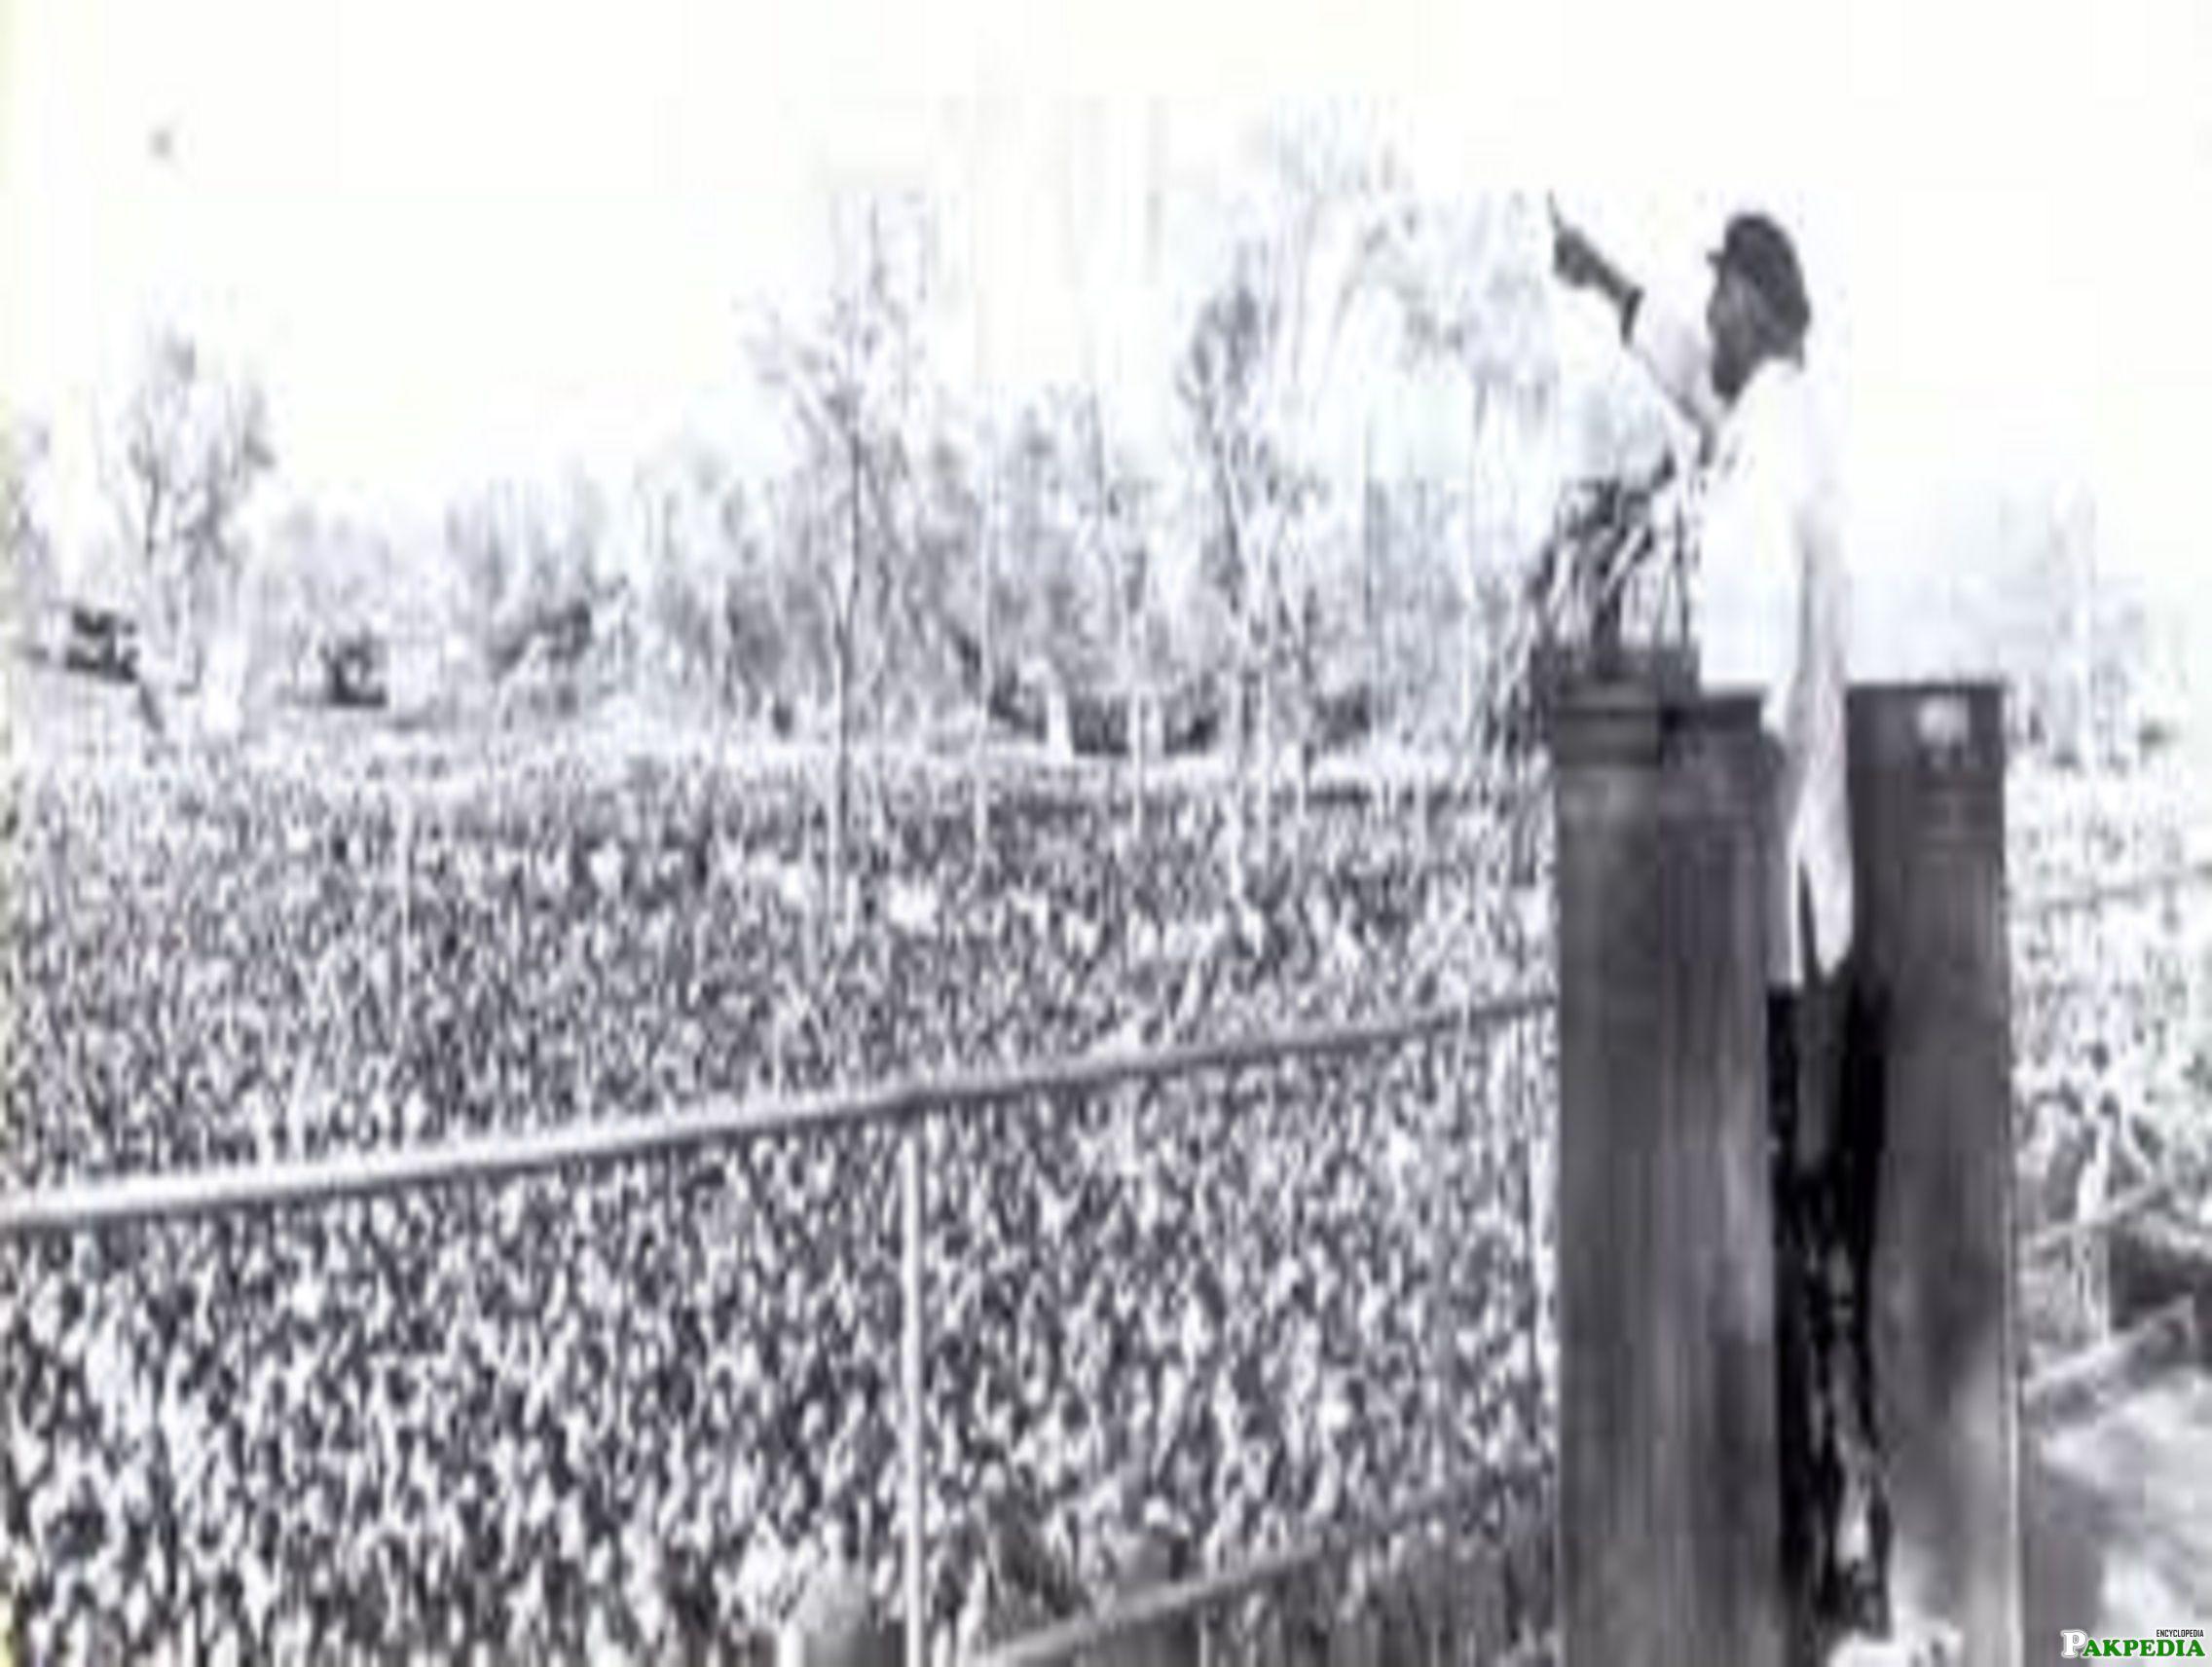 Zulfikar Ali Bhutto addresses to the people